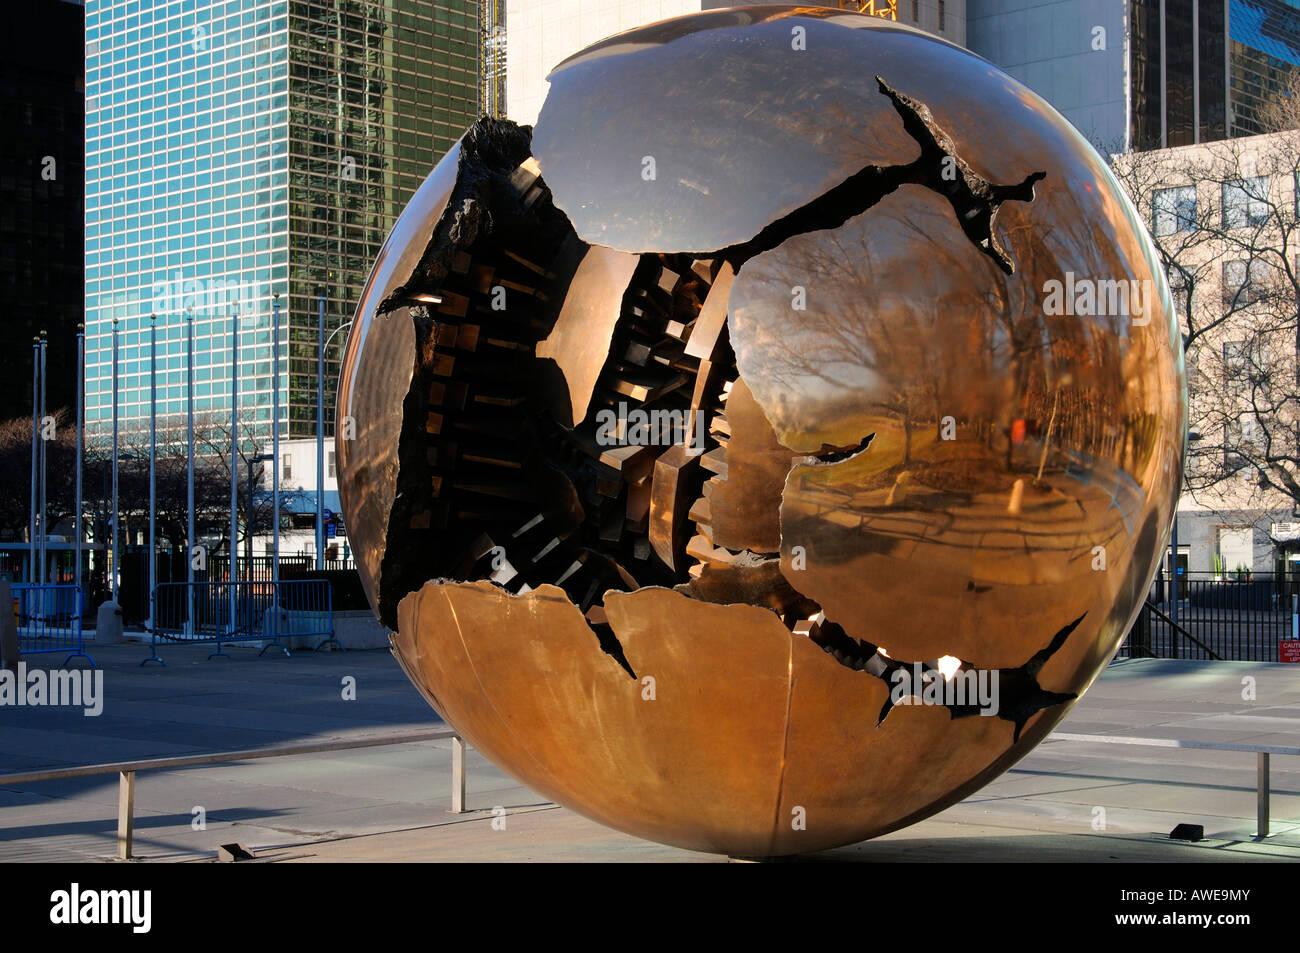 Bronzeskulptur Kugel in Kugel von Arnaldo Pomodoro, UN Garten, New York, USA Stockbild